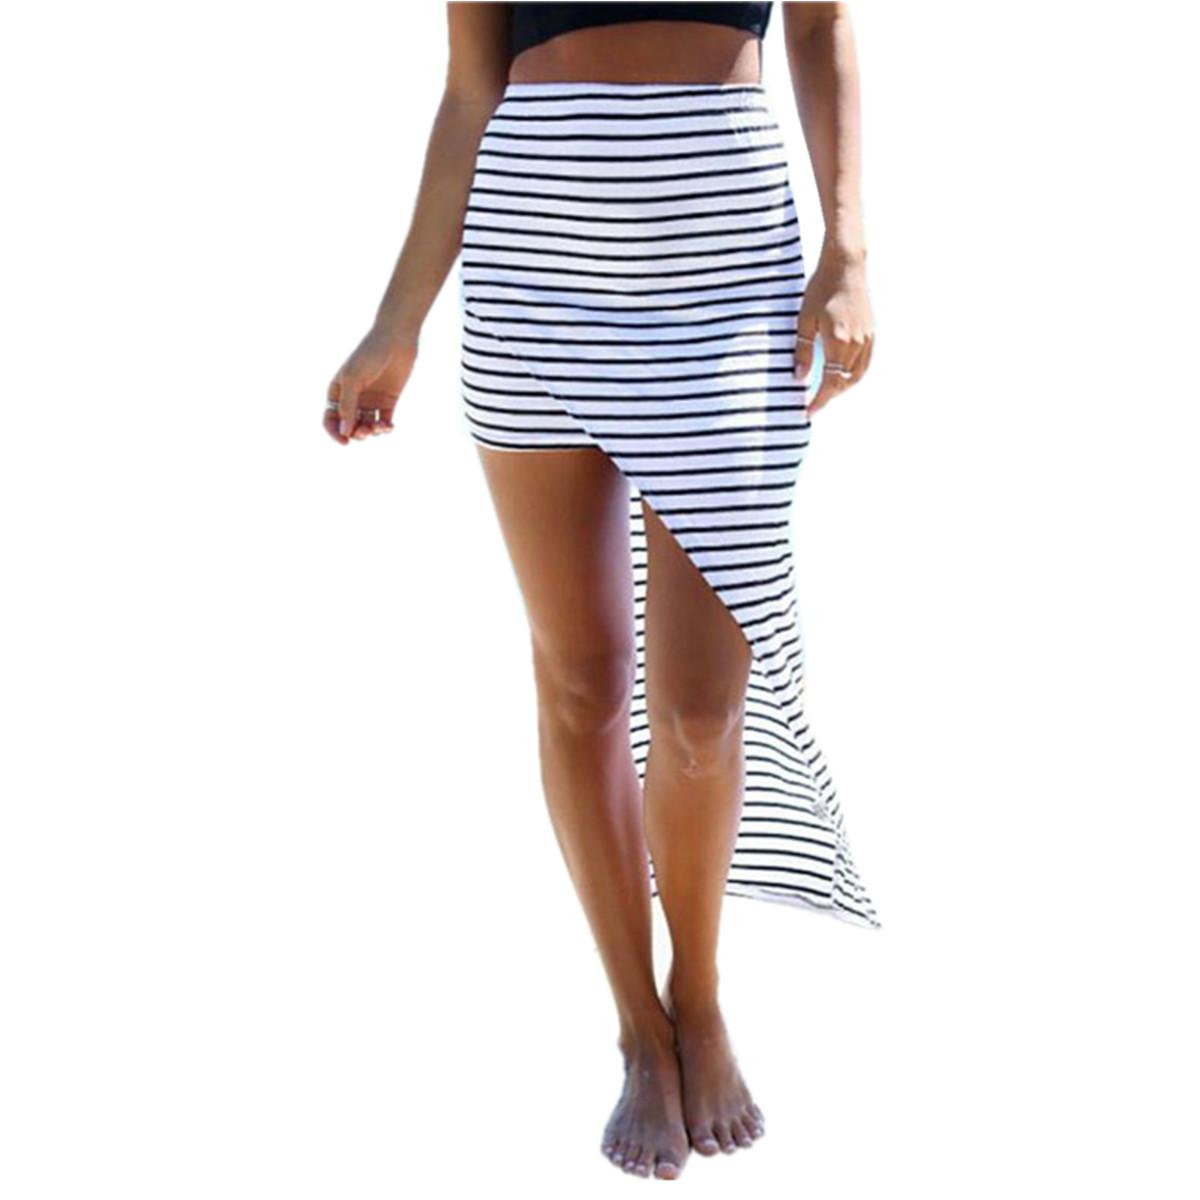 Maxi pencil cut skirt – Modern trending things photo blog